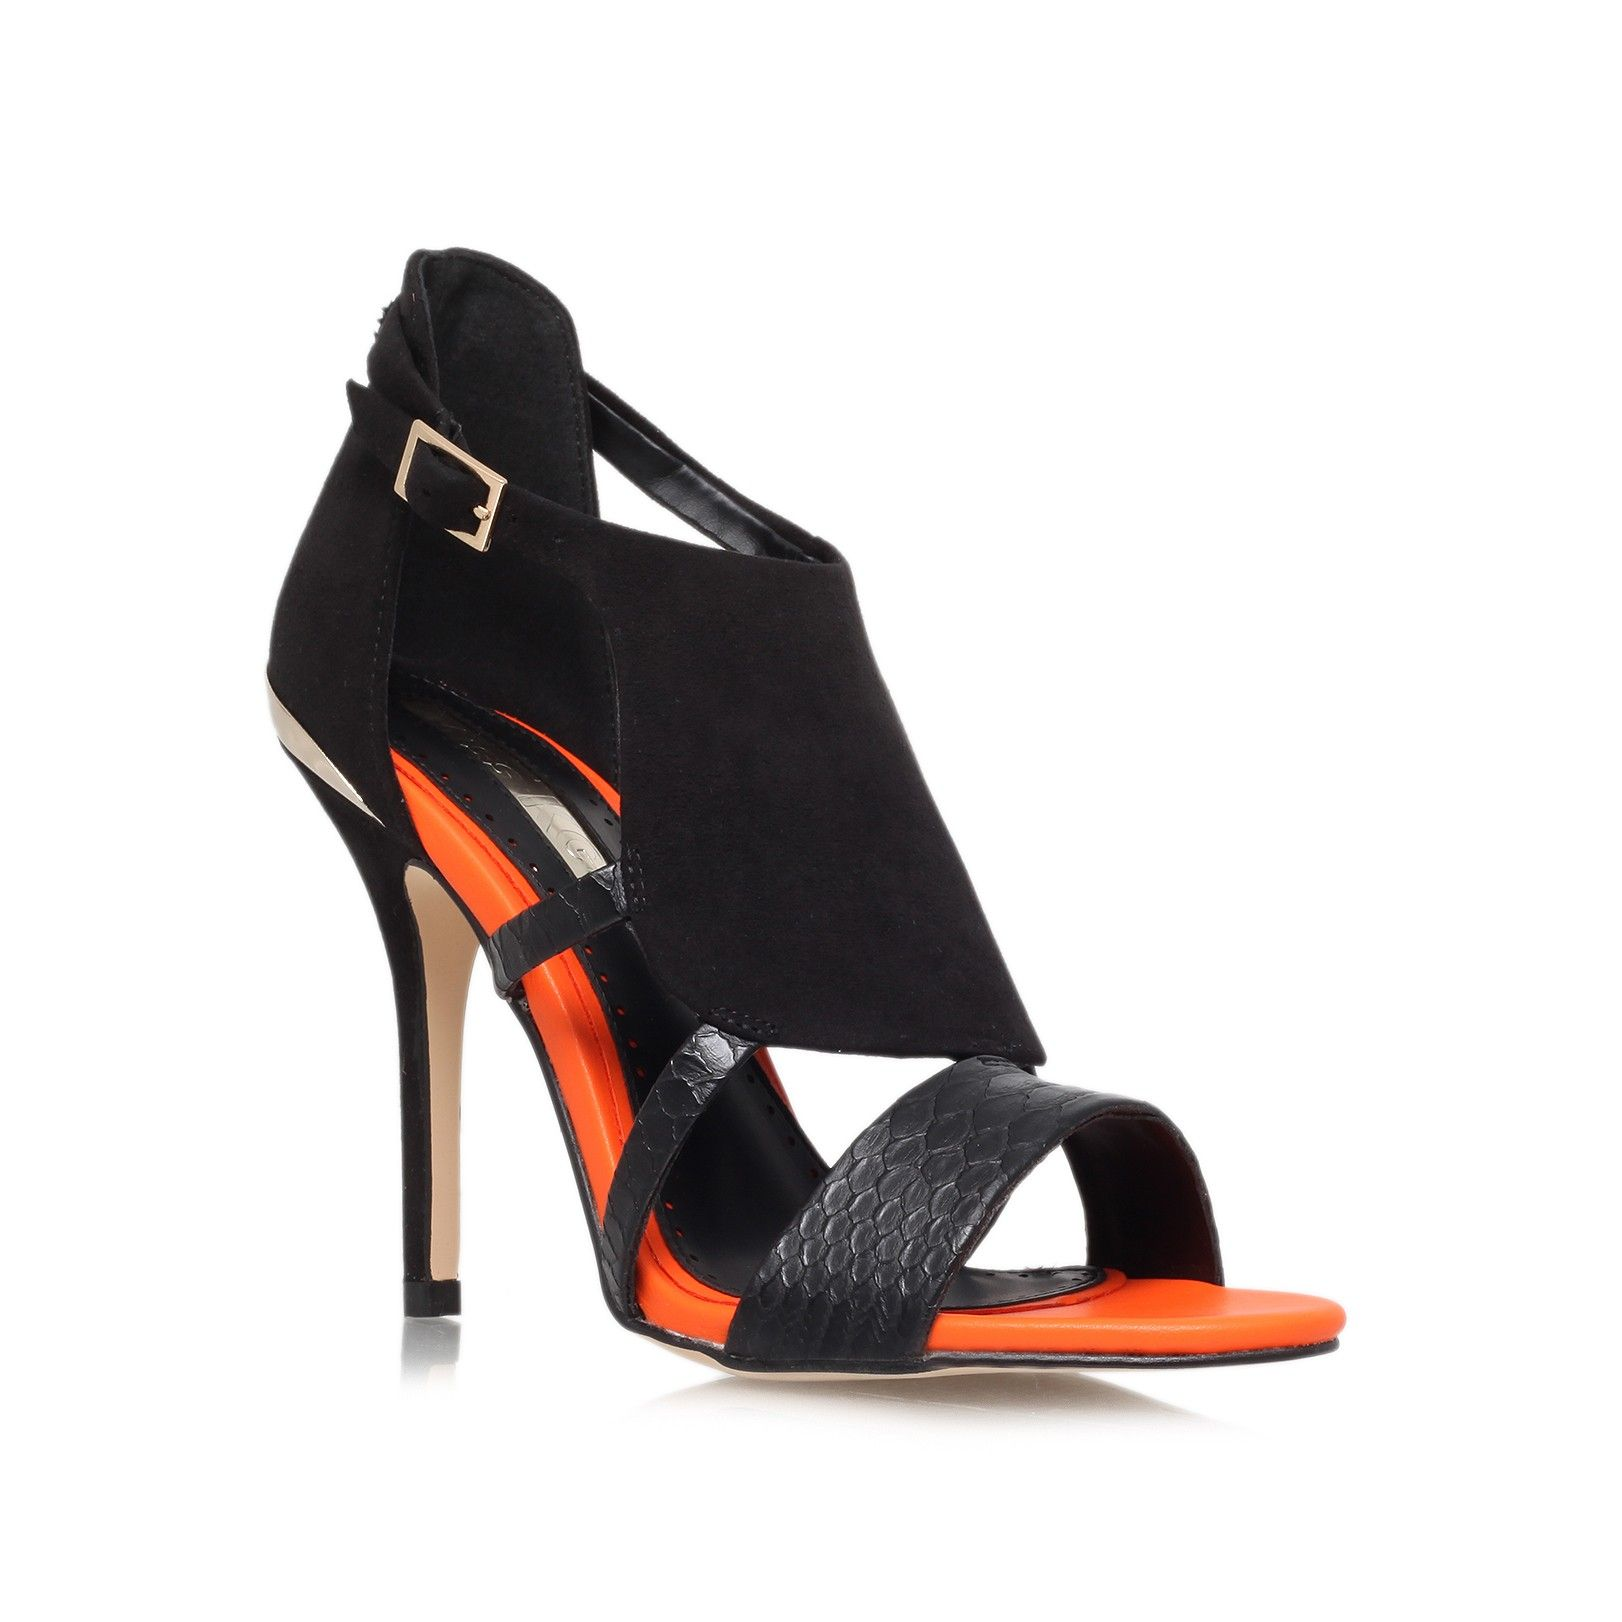 77a56961946 honest, black shoe by miss kg - women shoes sandals high heels #prom ...